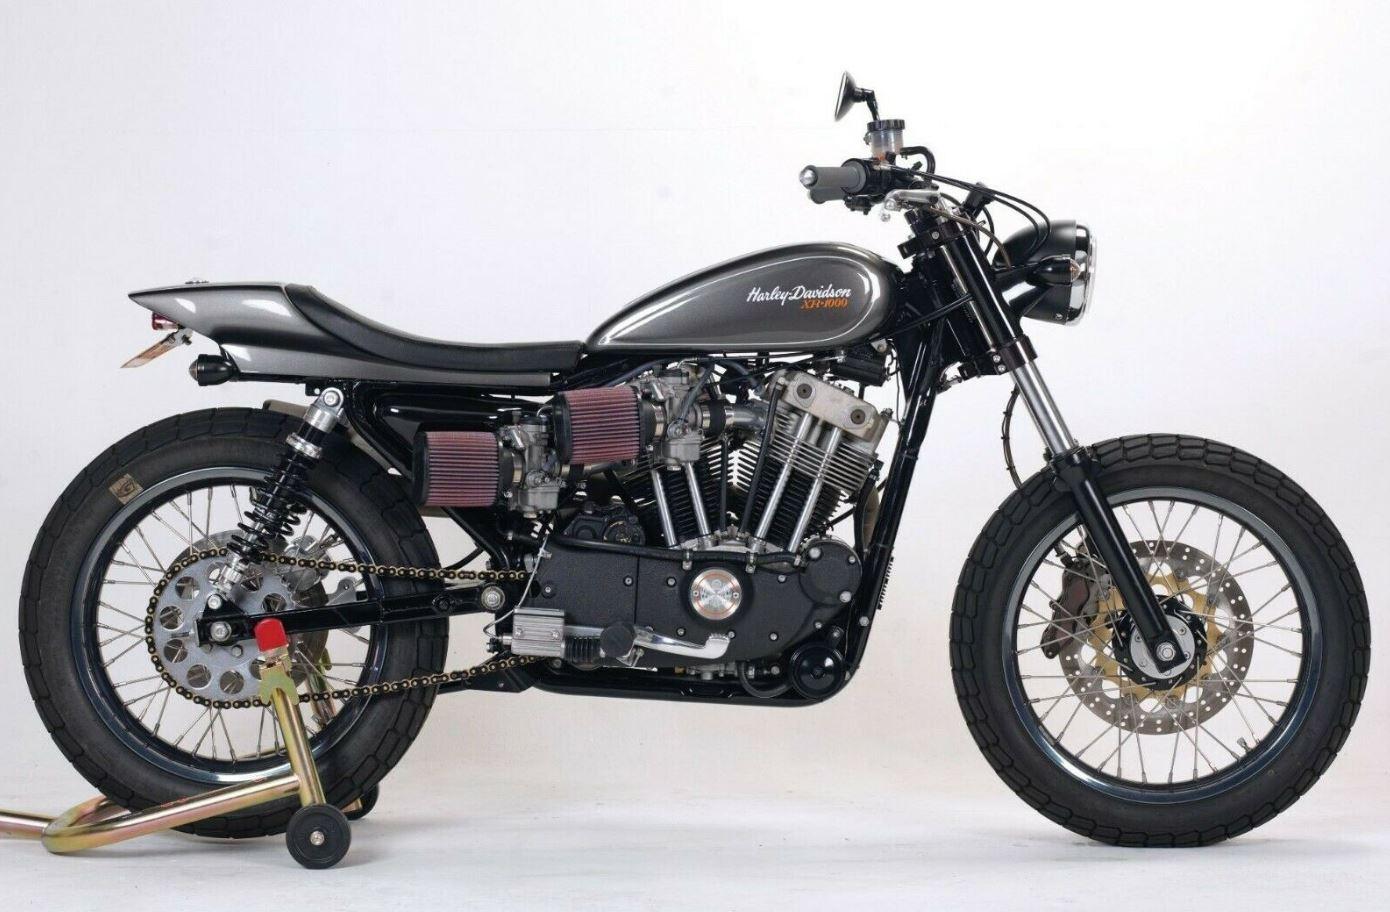 Mule Motorcycles Street Tracker – 1984 Harley-Davidson XR1000